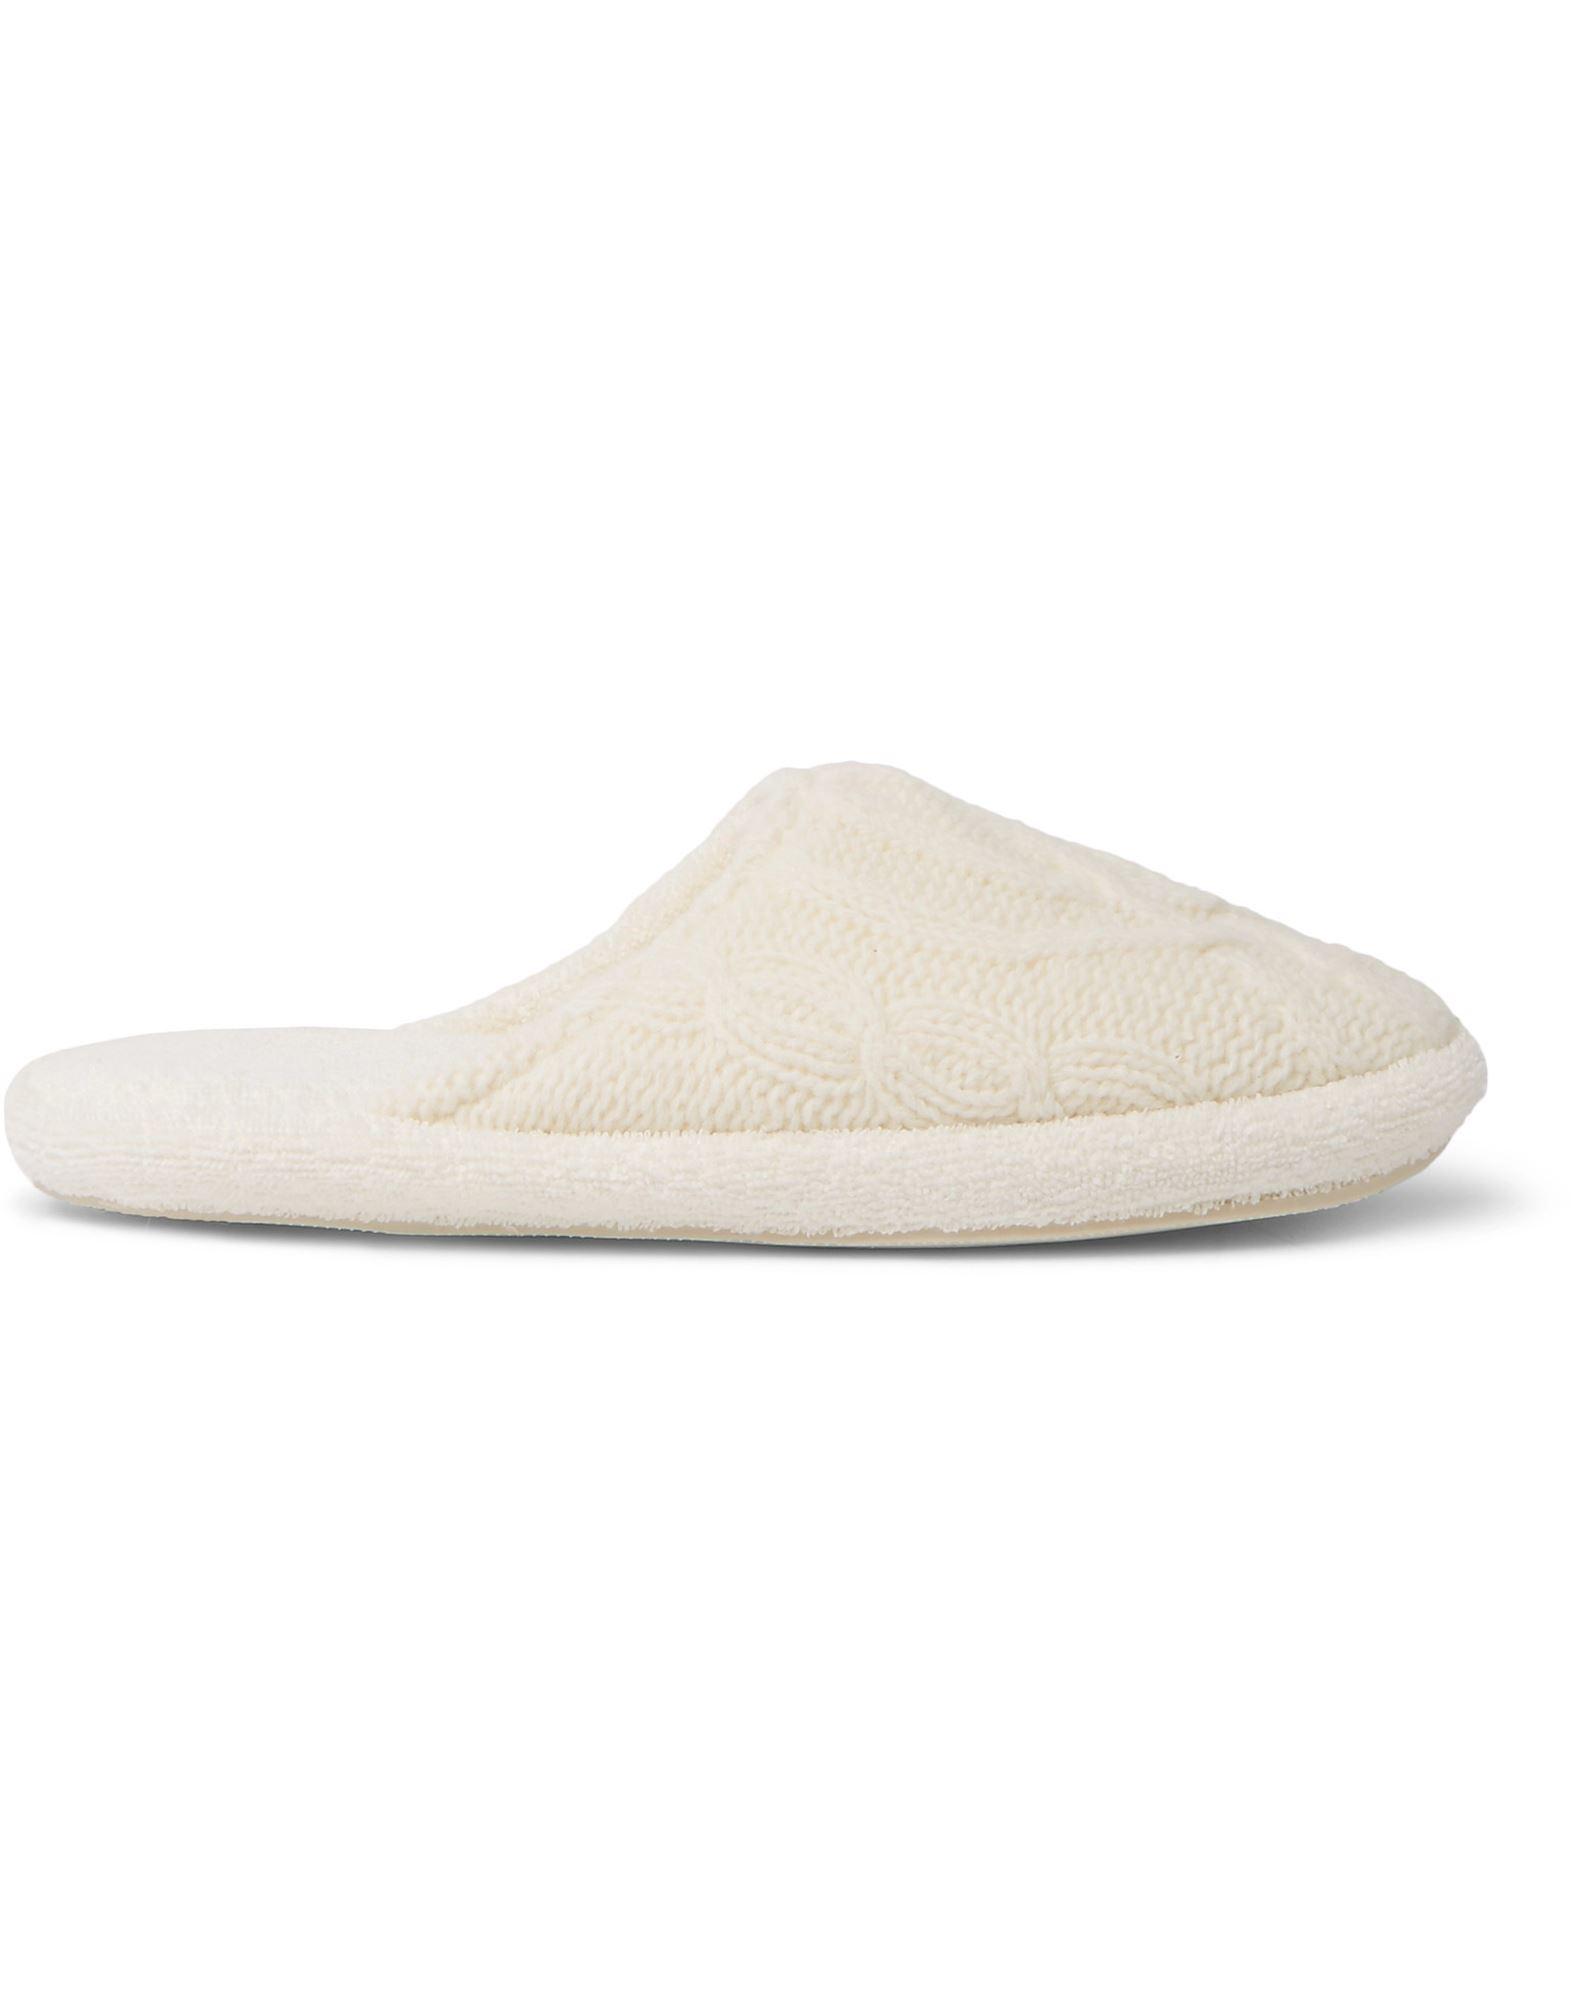 SOHO HOME Домашние туфли